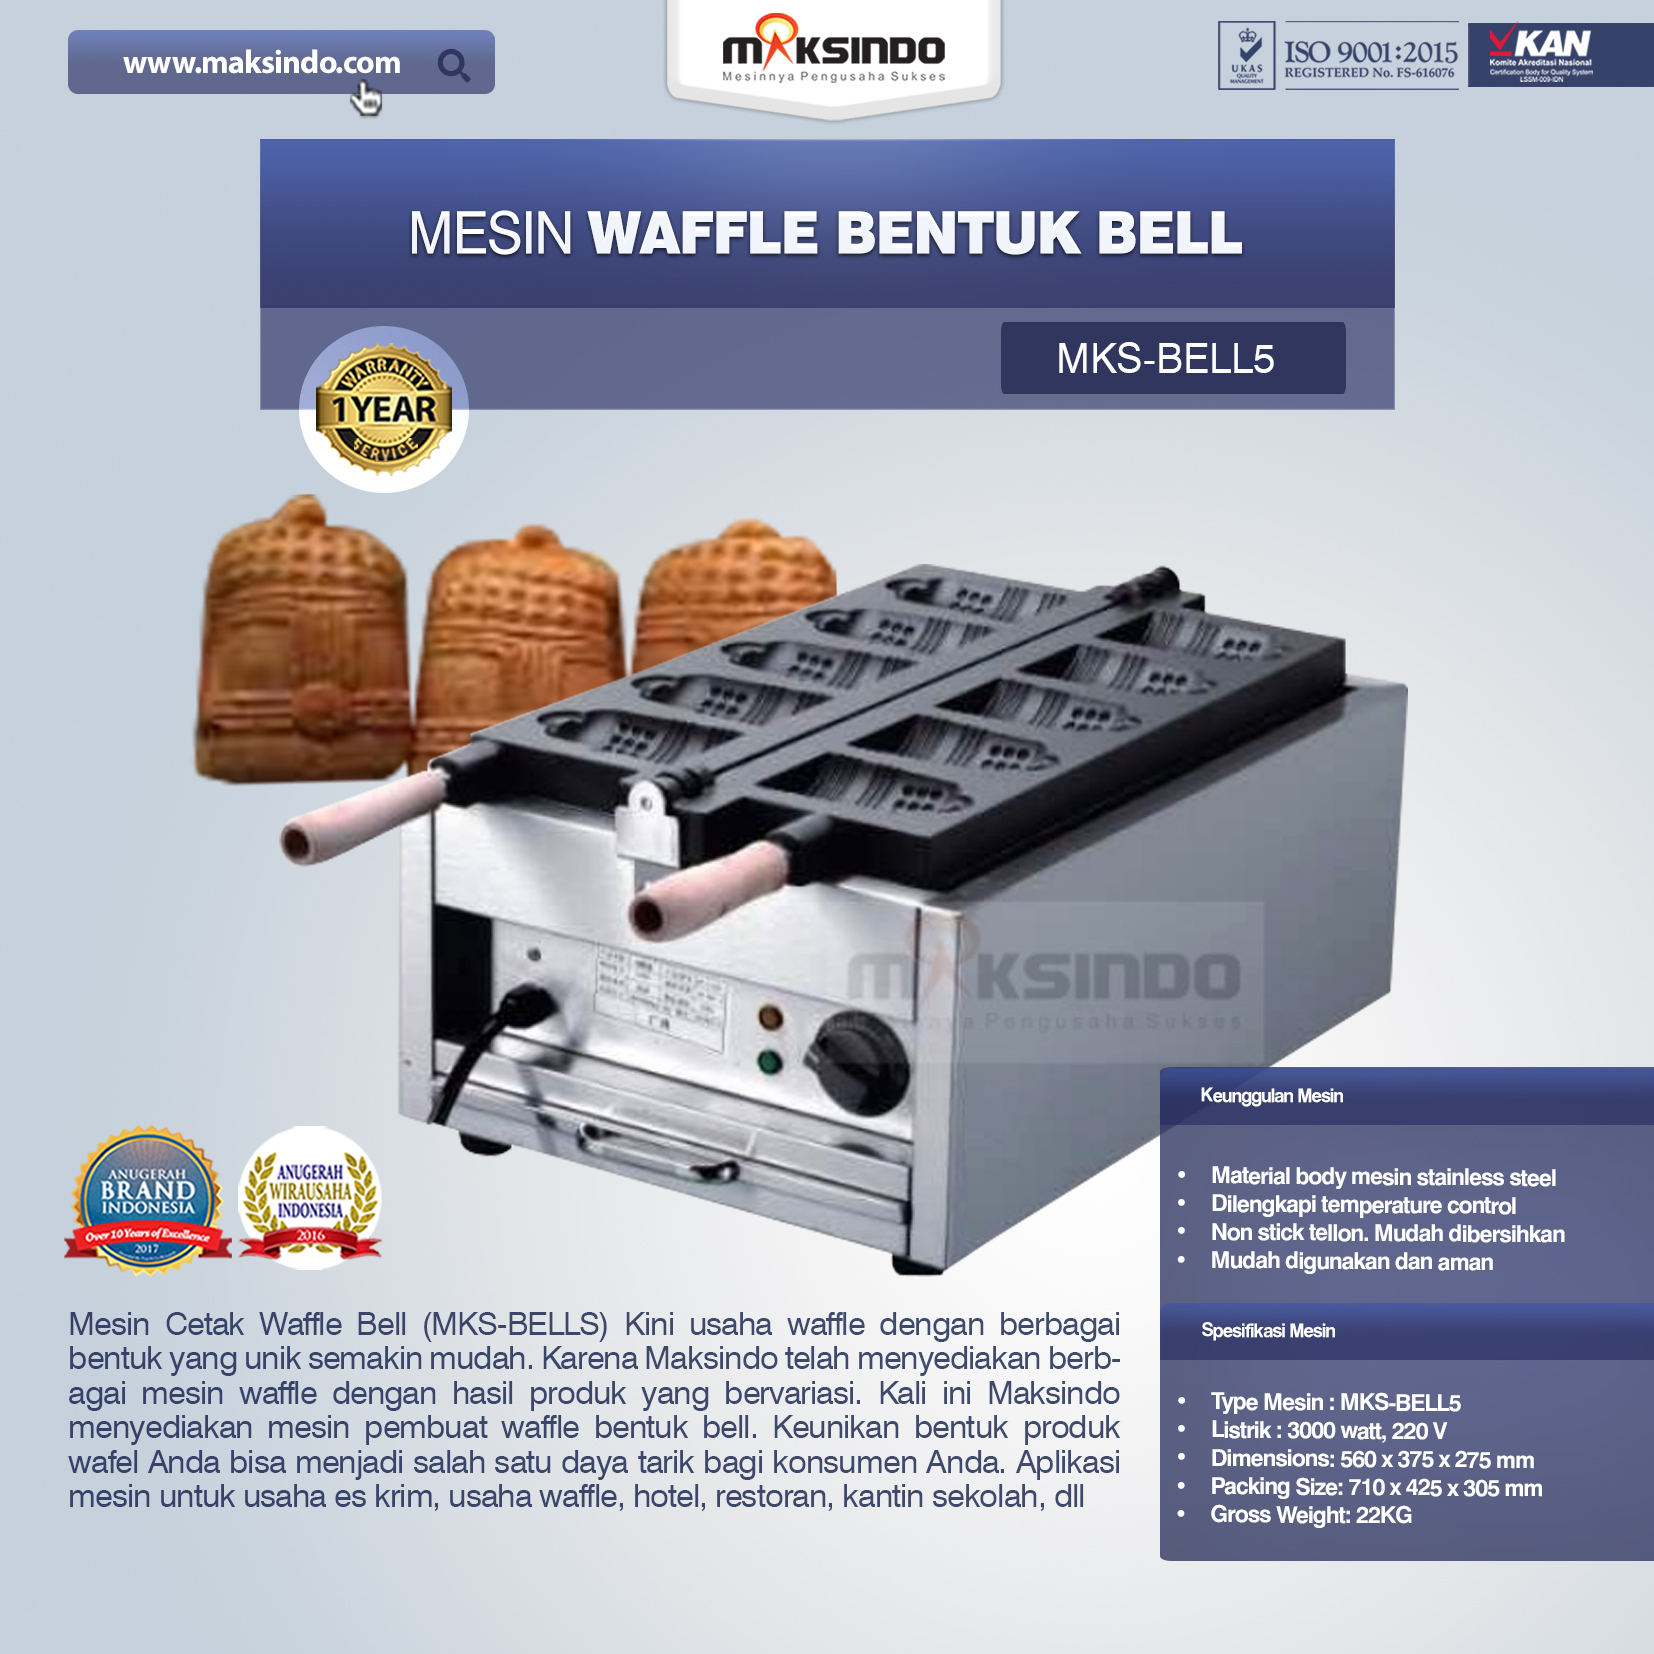 Mesin Waffle Bentuk Bell (MKS-BELL5)